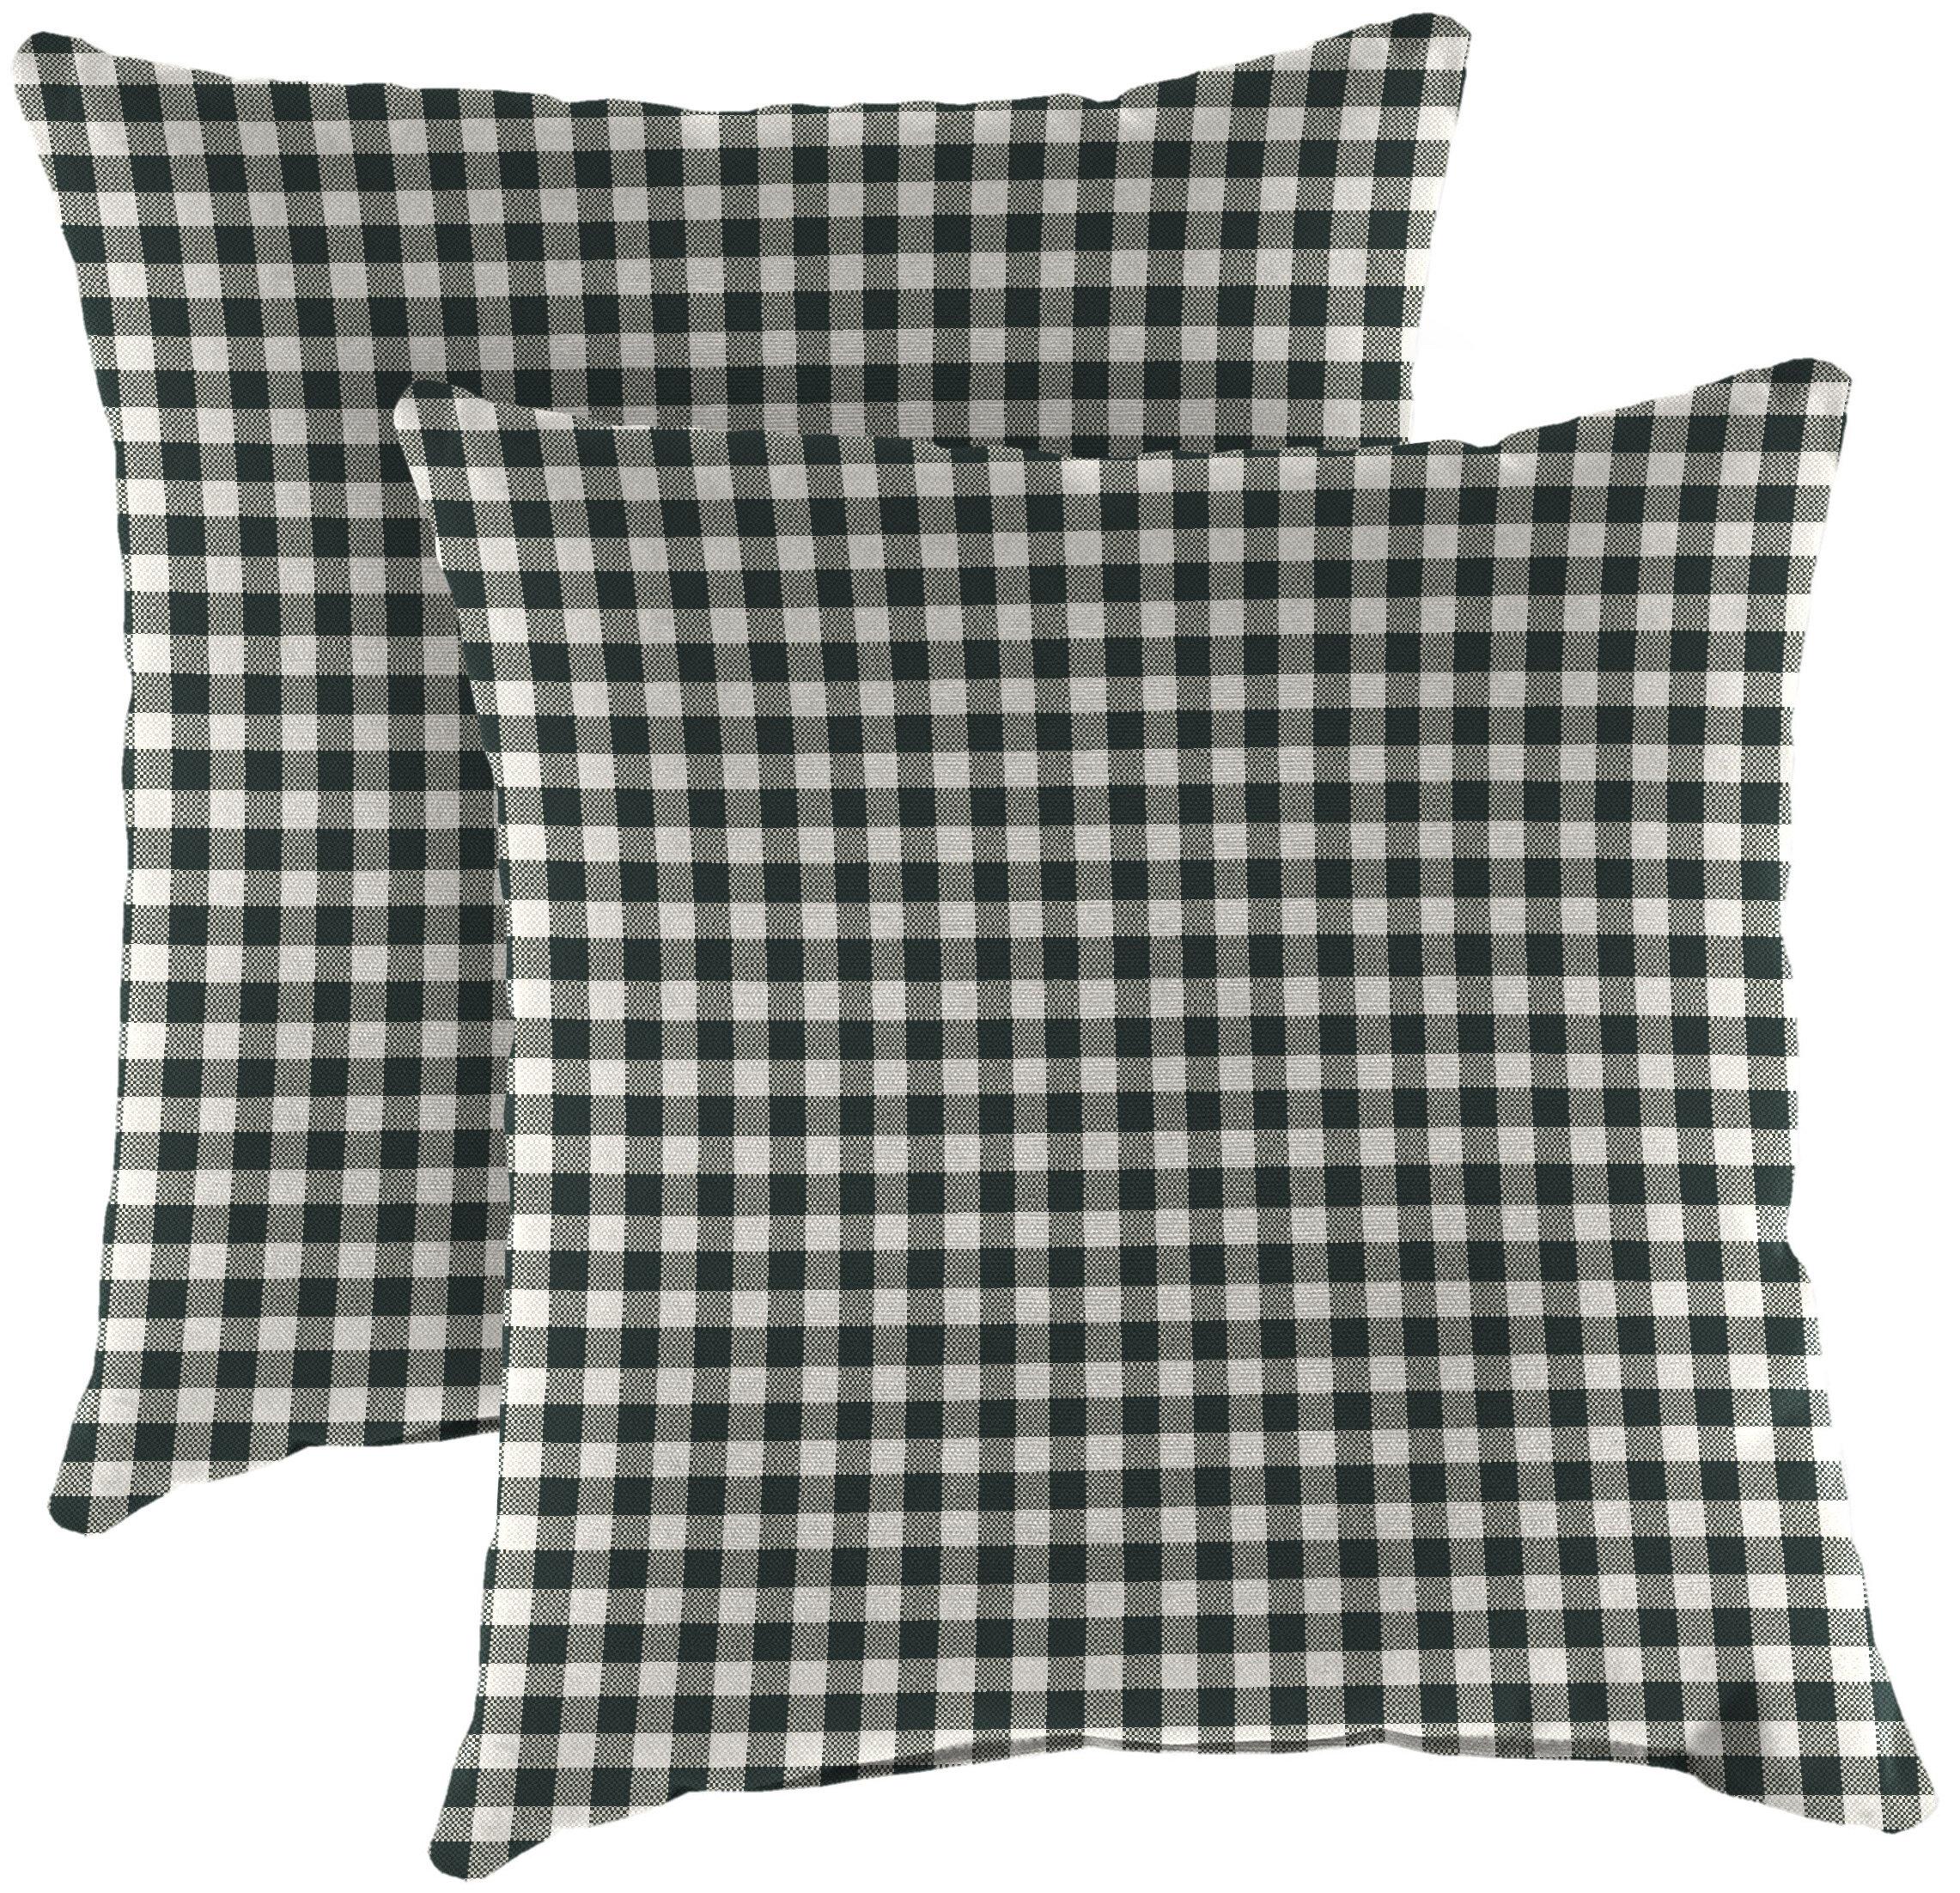 Rosalind Wheeler Washburn Indoor Outdoor Checkered Throw Pillow Wayfair